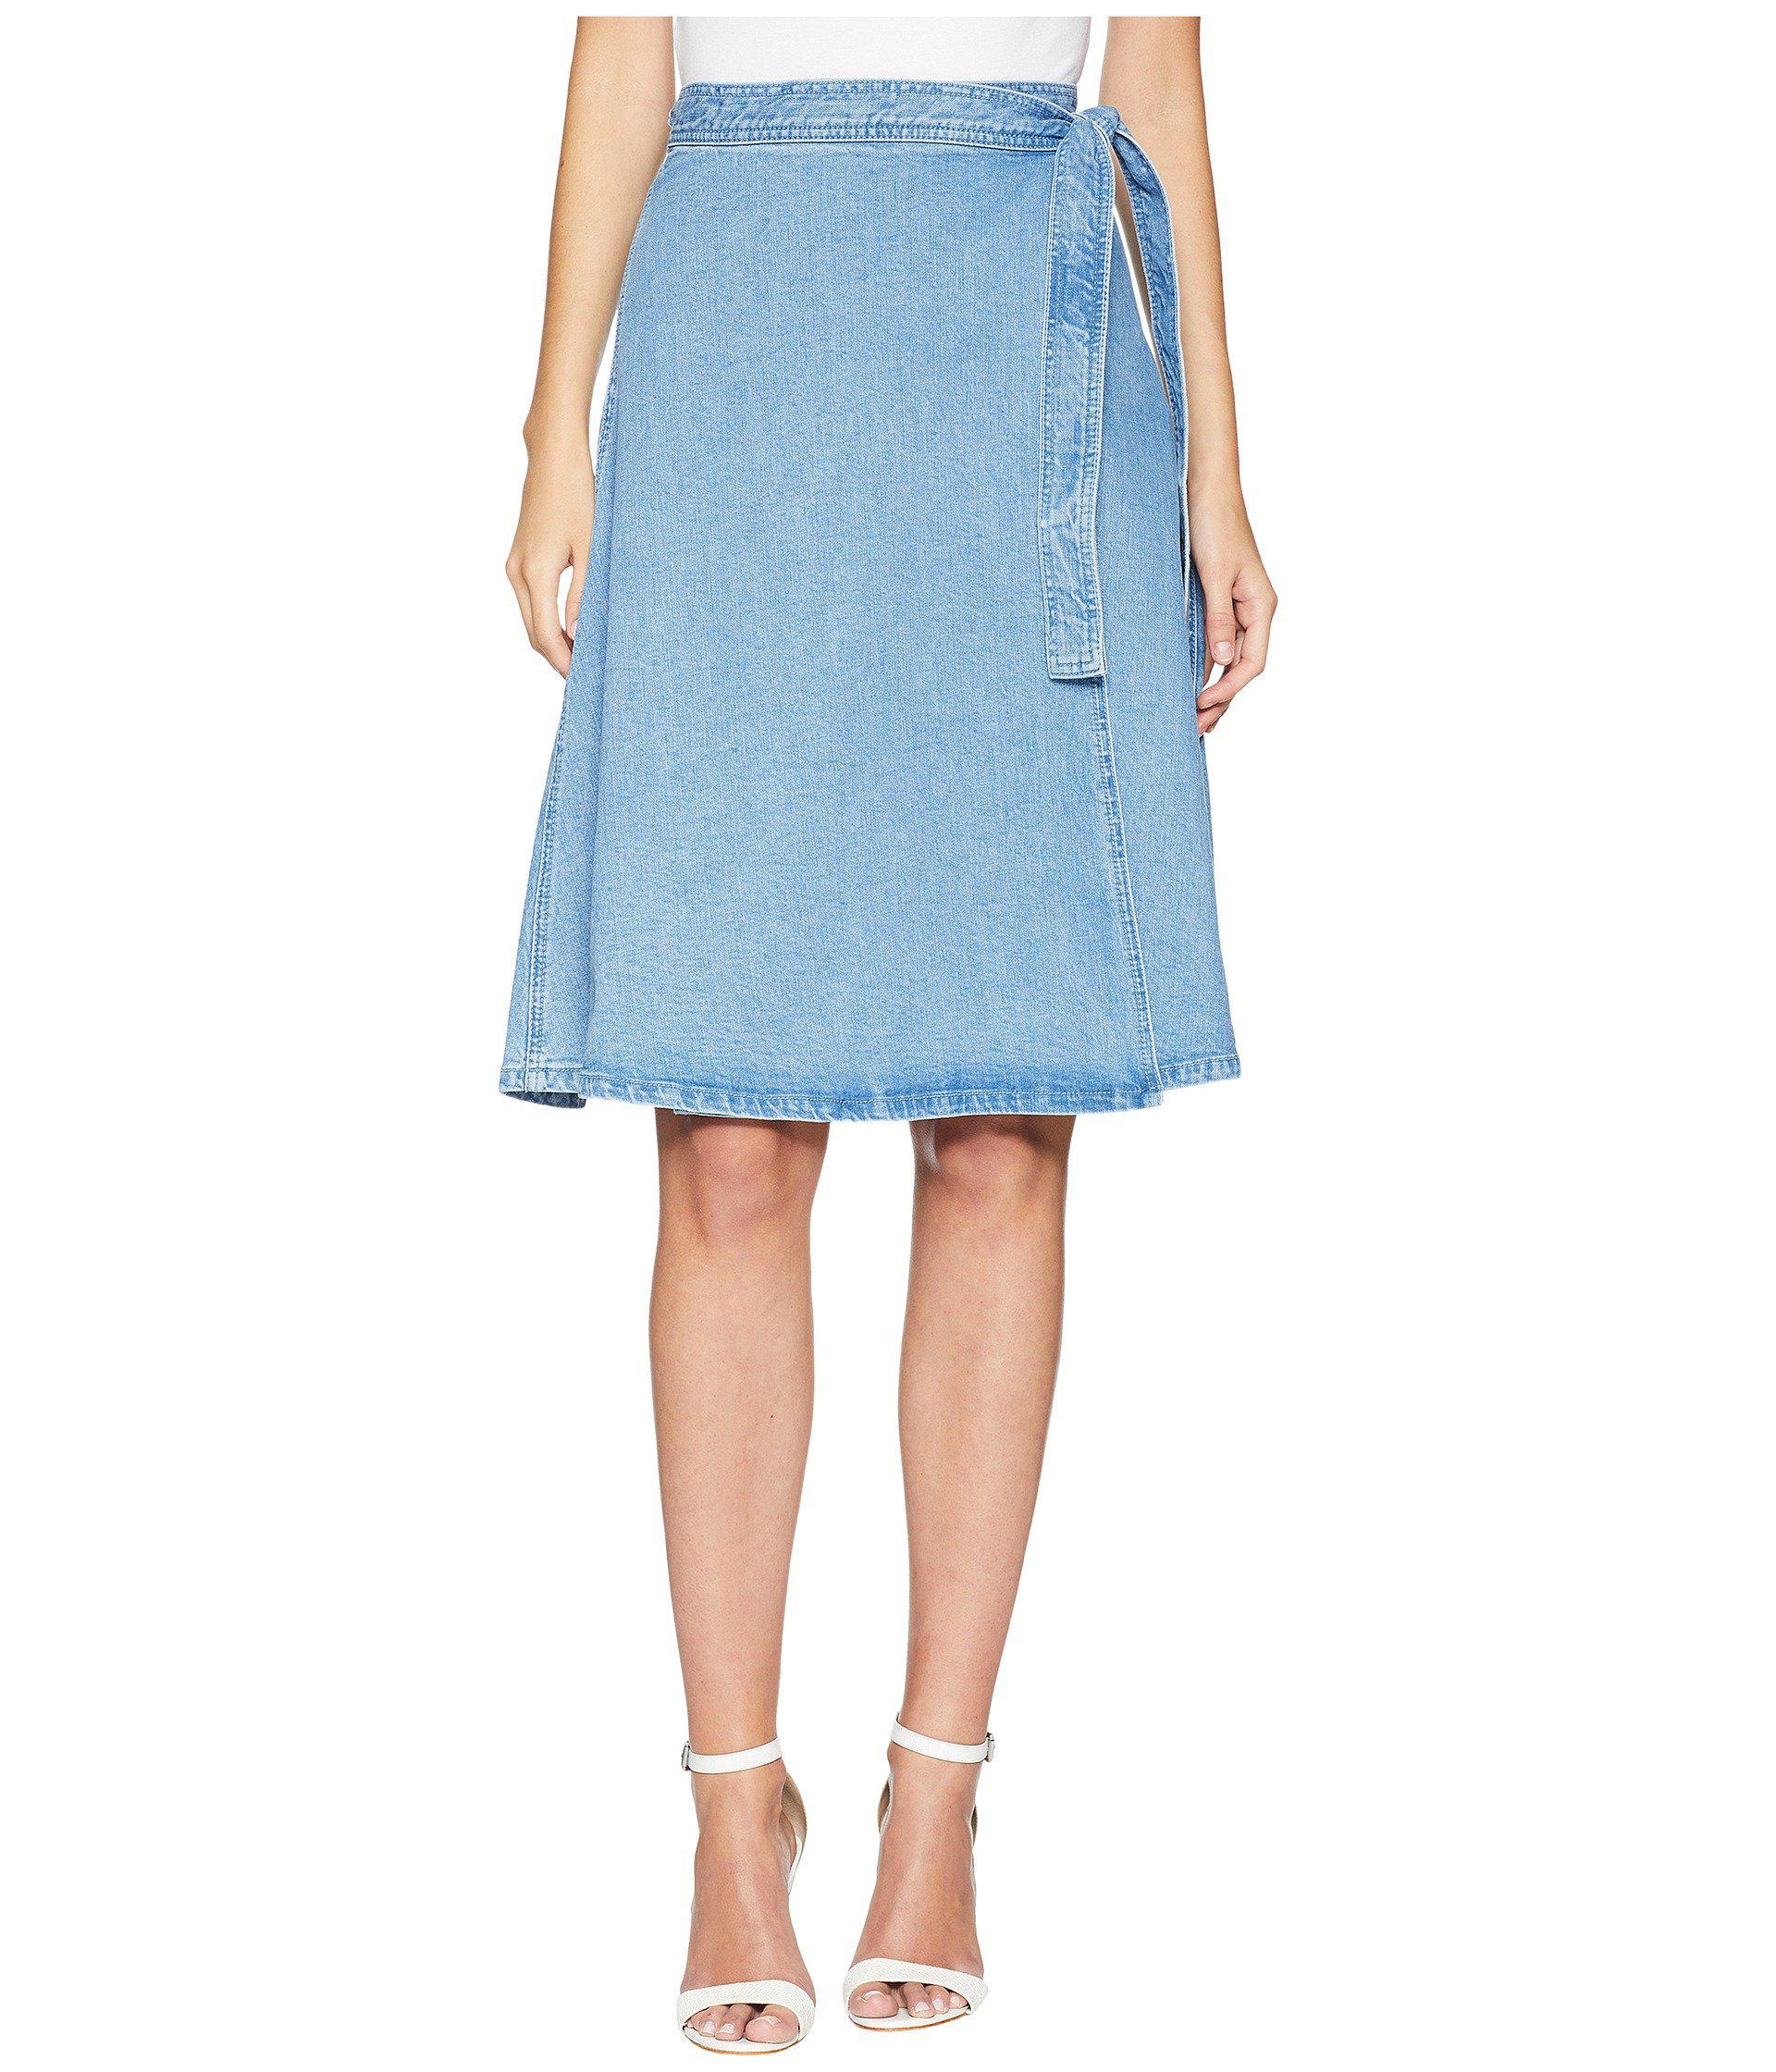 60ccea586350 Kate Spade Vintage Denim Wrap Skirt in Blue - Lyst